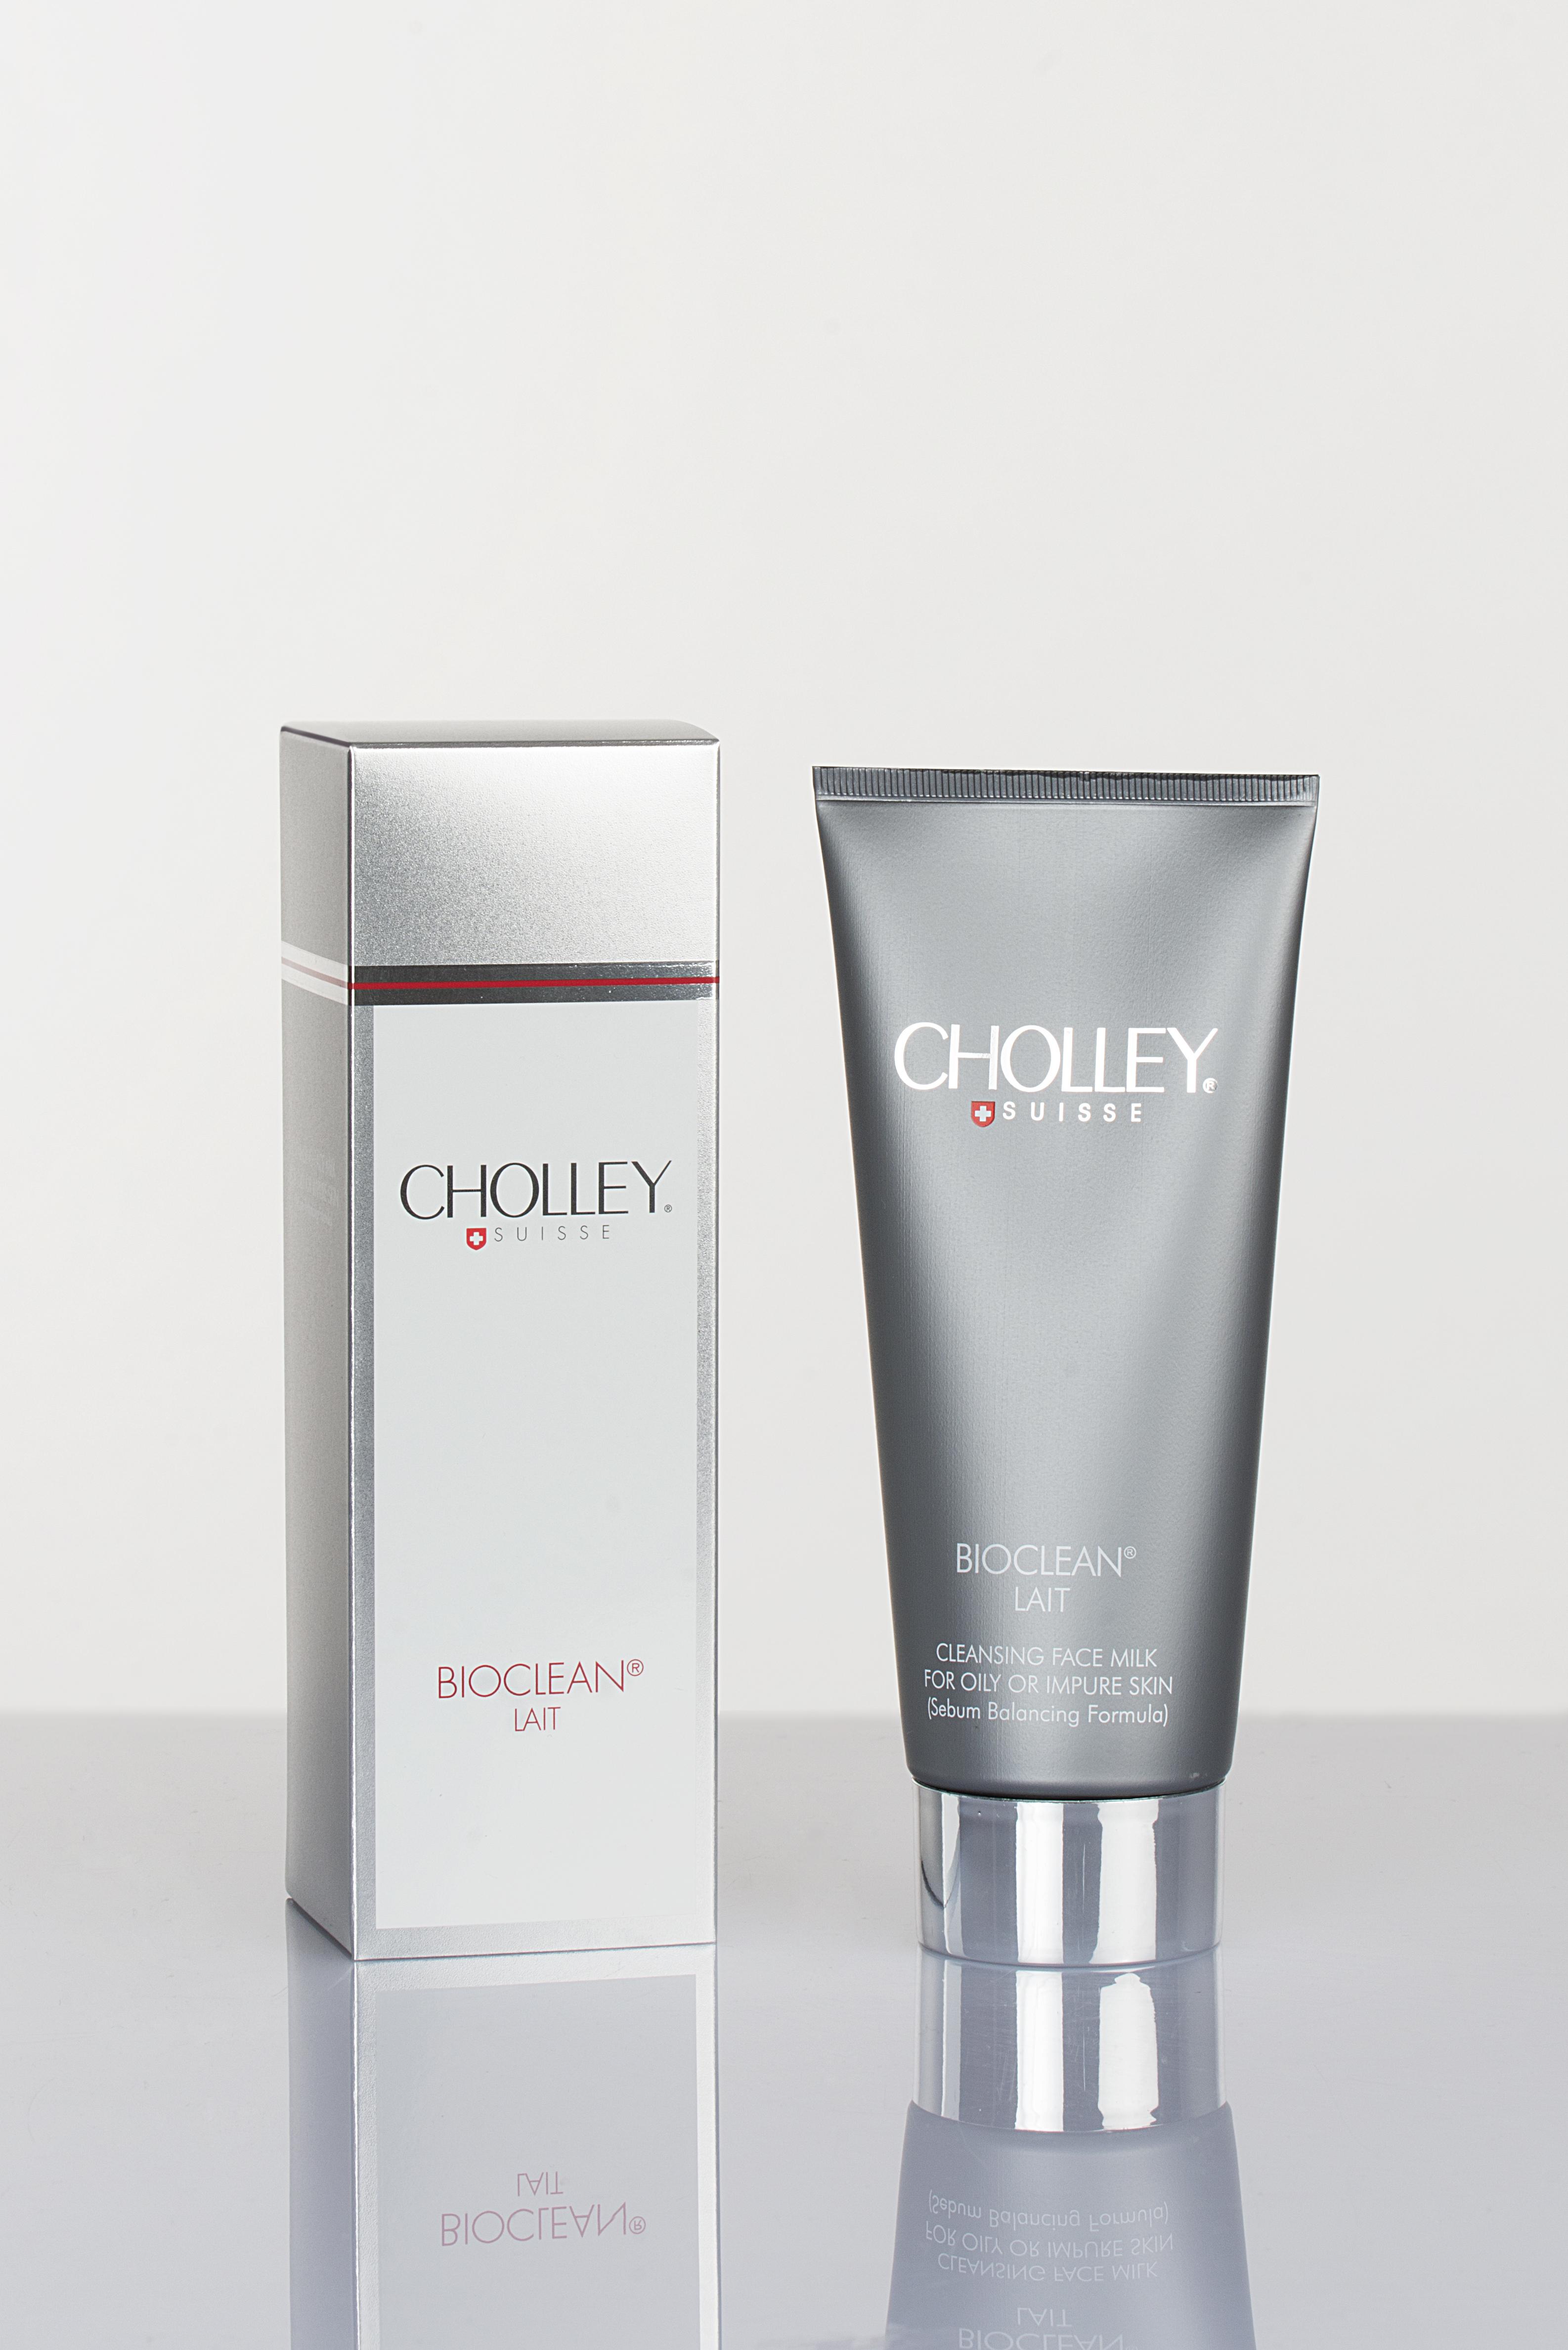 Bioclean Lait Sebo Balance Impure Oily Mixed skins